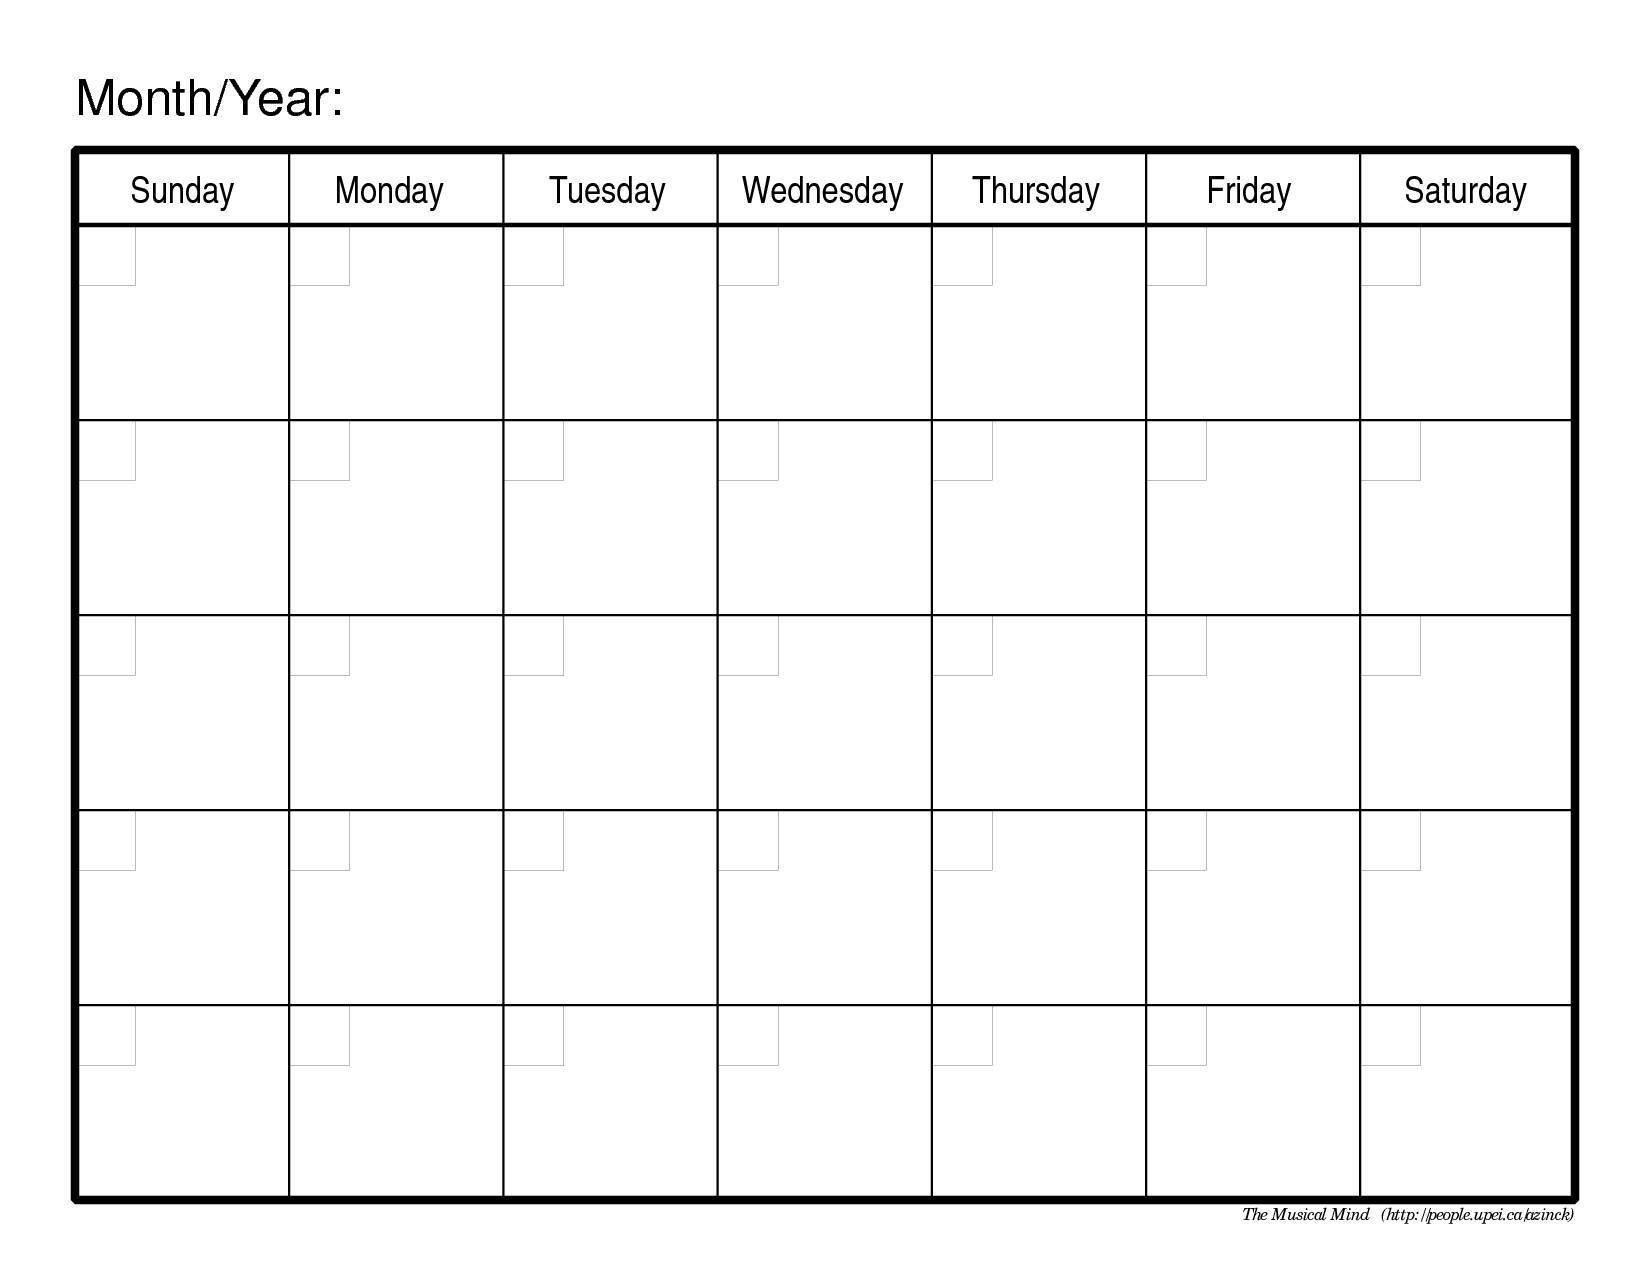 Monthly-Calendar-Template-Image 1 Month Calendar Printable Blank  1 Month Calendar Printable Blank